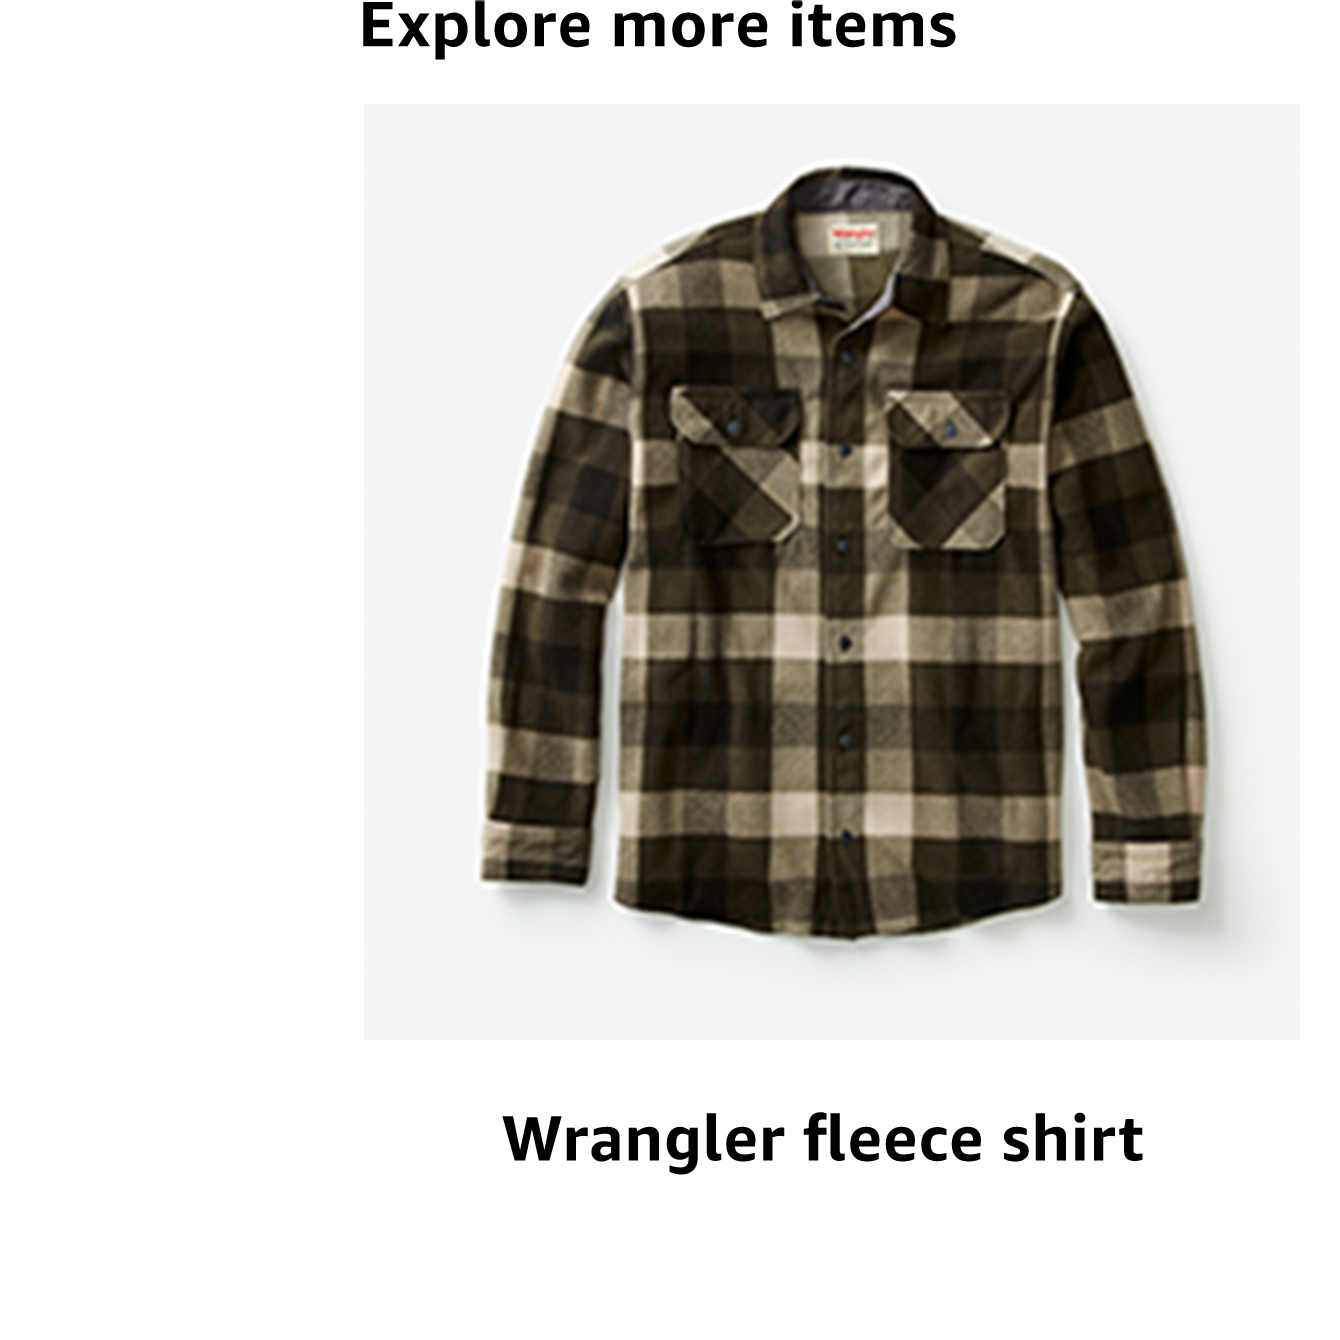 Wrangler fleece shirt